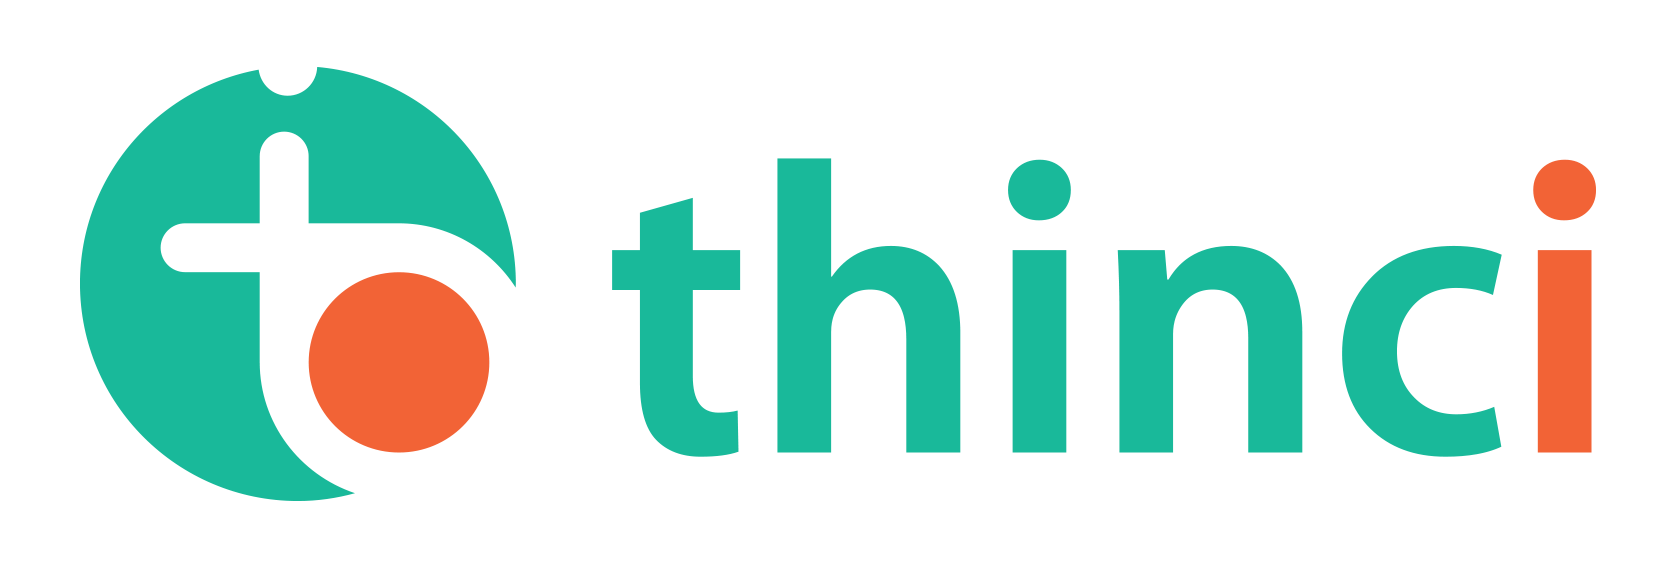 Thinci_logo_.png